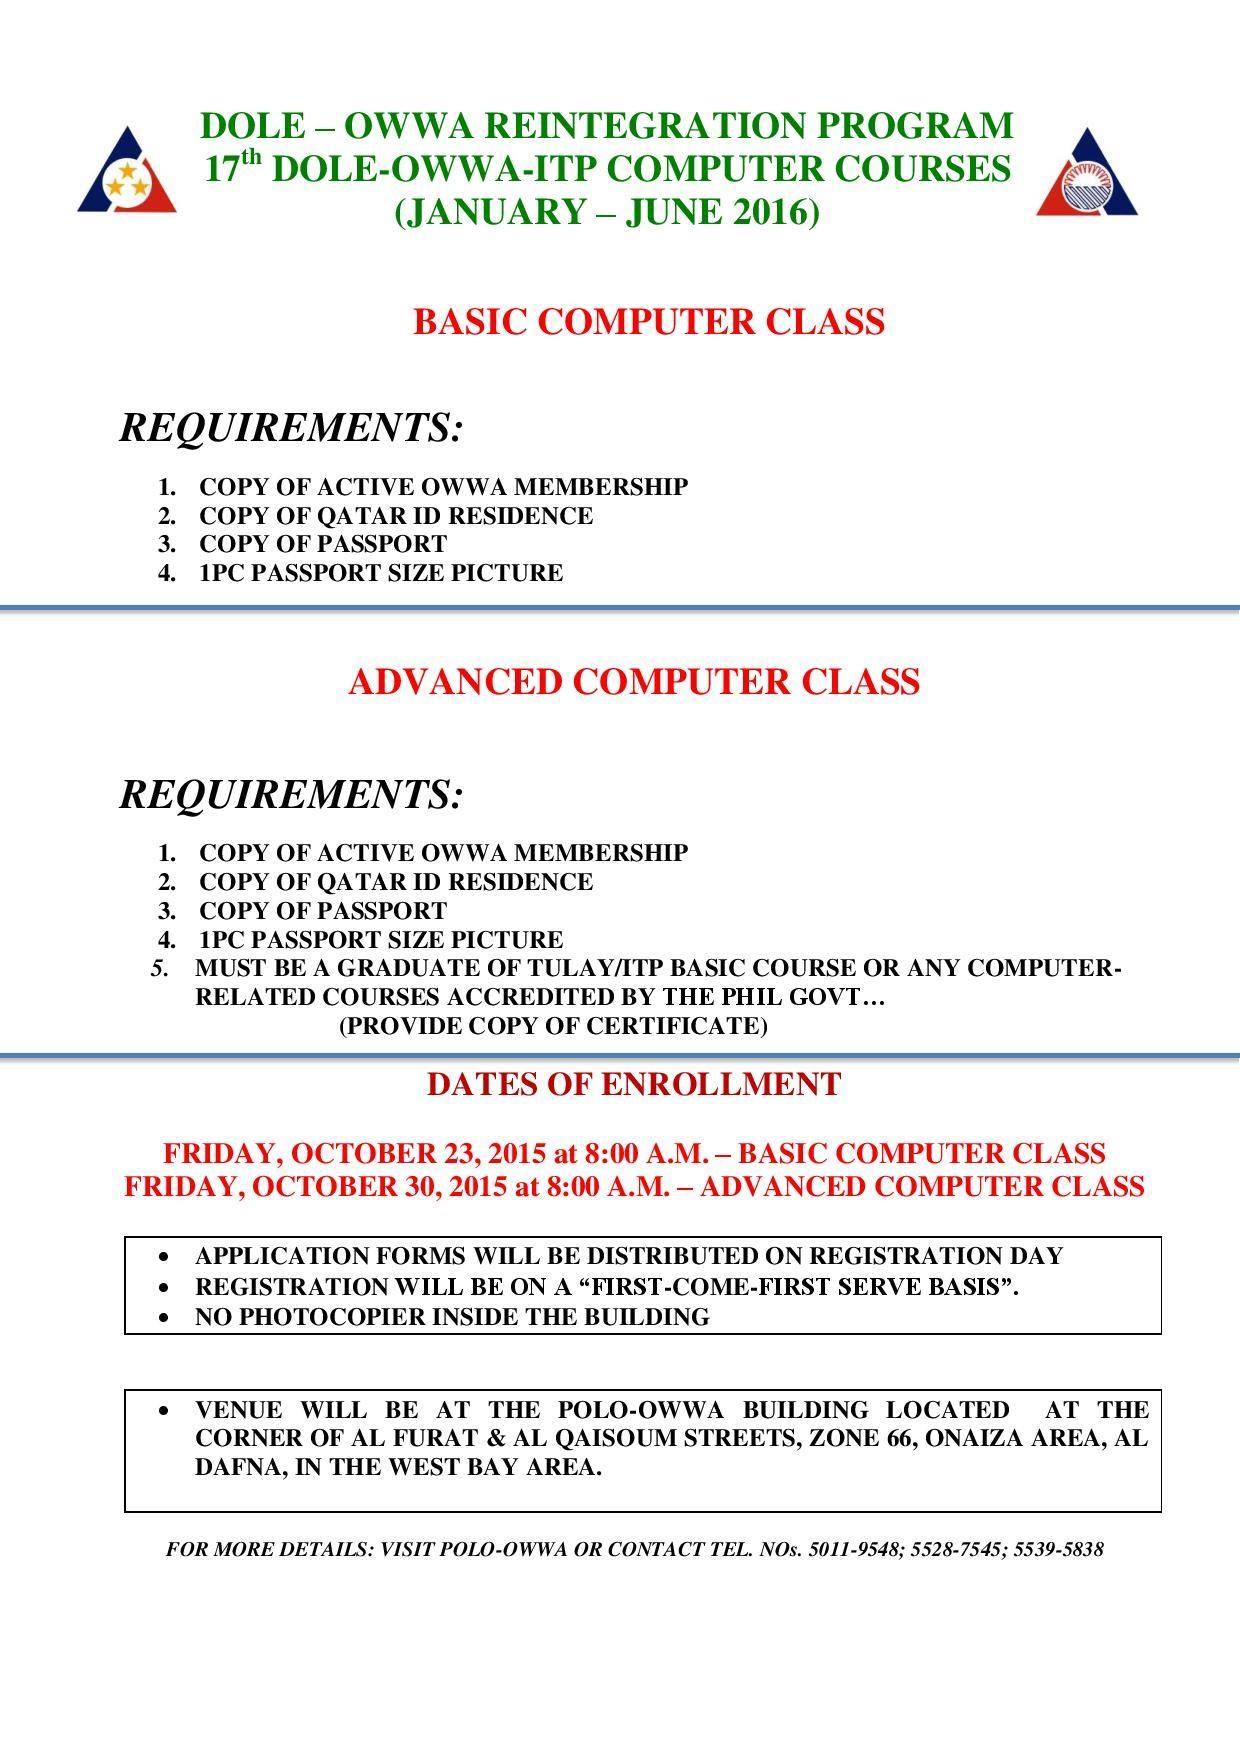 DOLE-OWWA Reintergration Program 17th Computer Courses Program